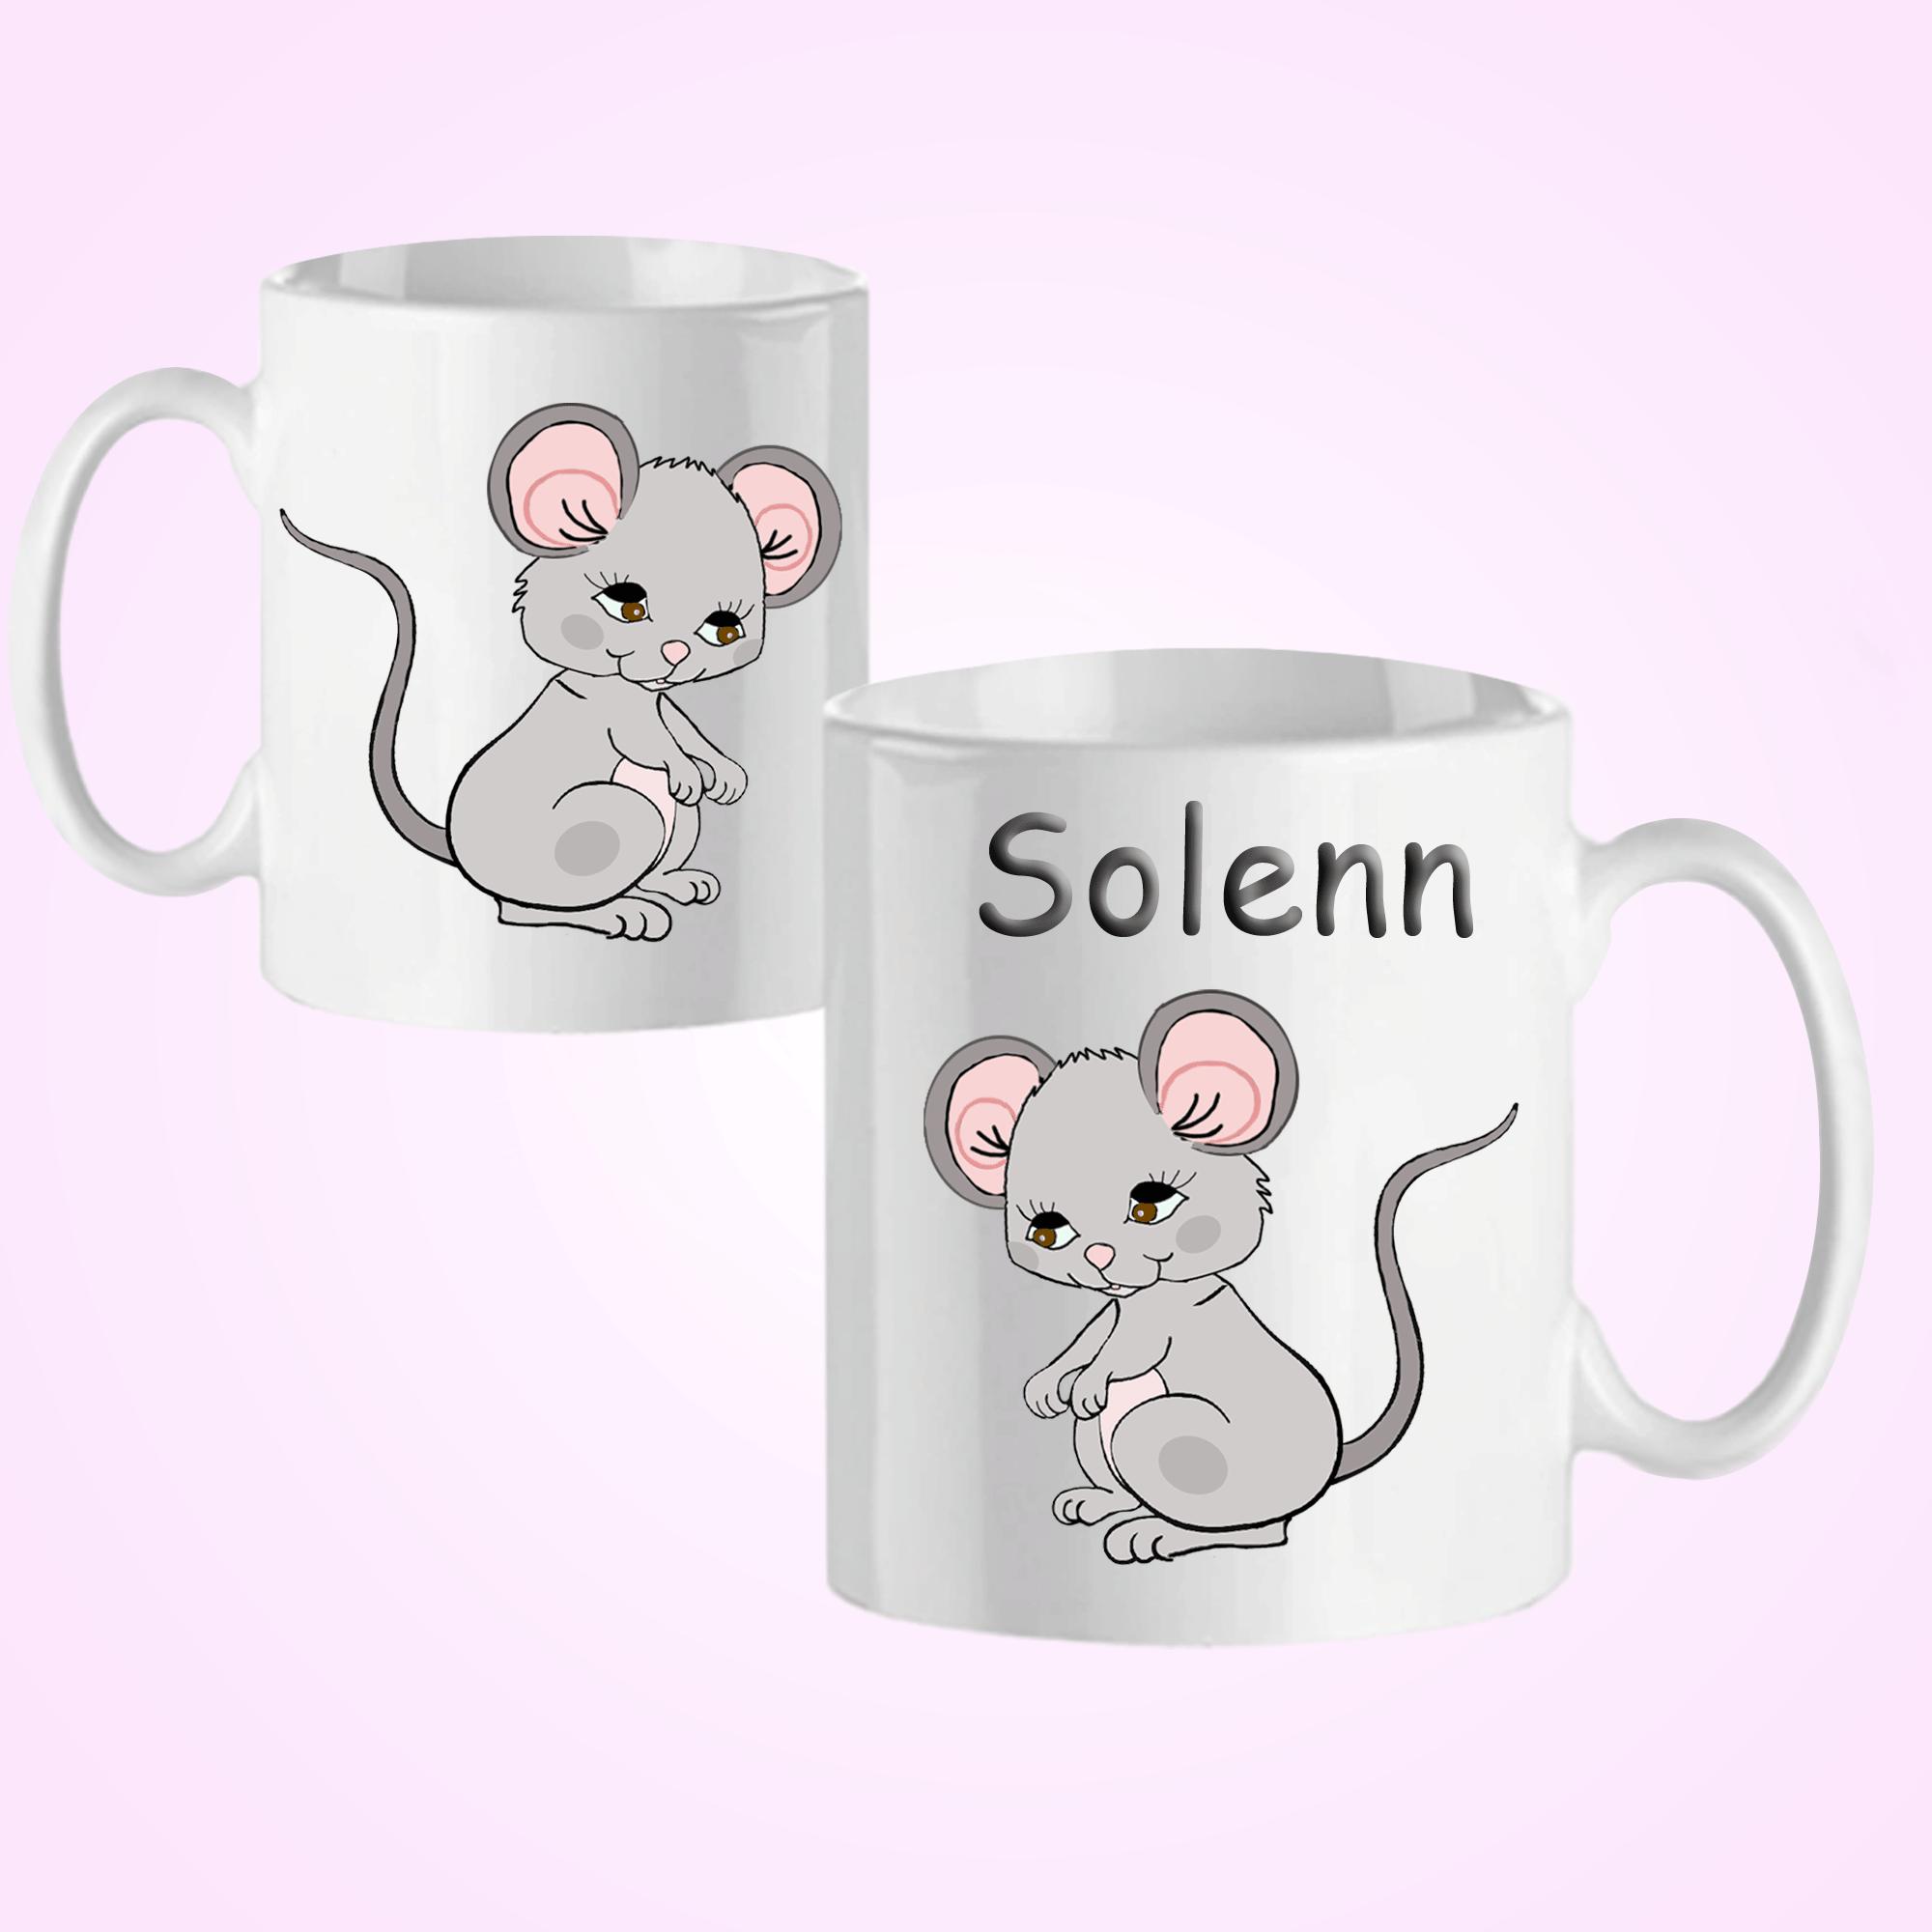 mug-souris-prenom-personnalisable-personnalisation-personnalise-blanc-ceramique-animal-souriceau-rat-raton-fromage-gruyere-solenn